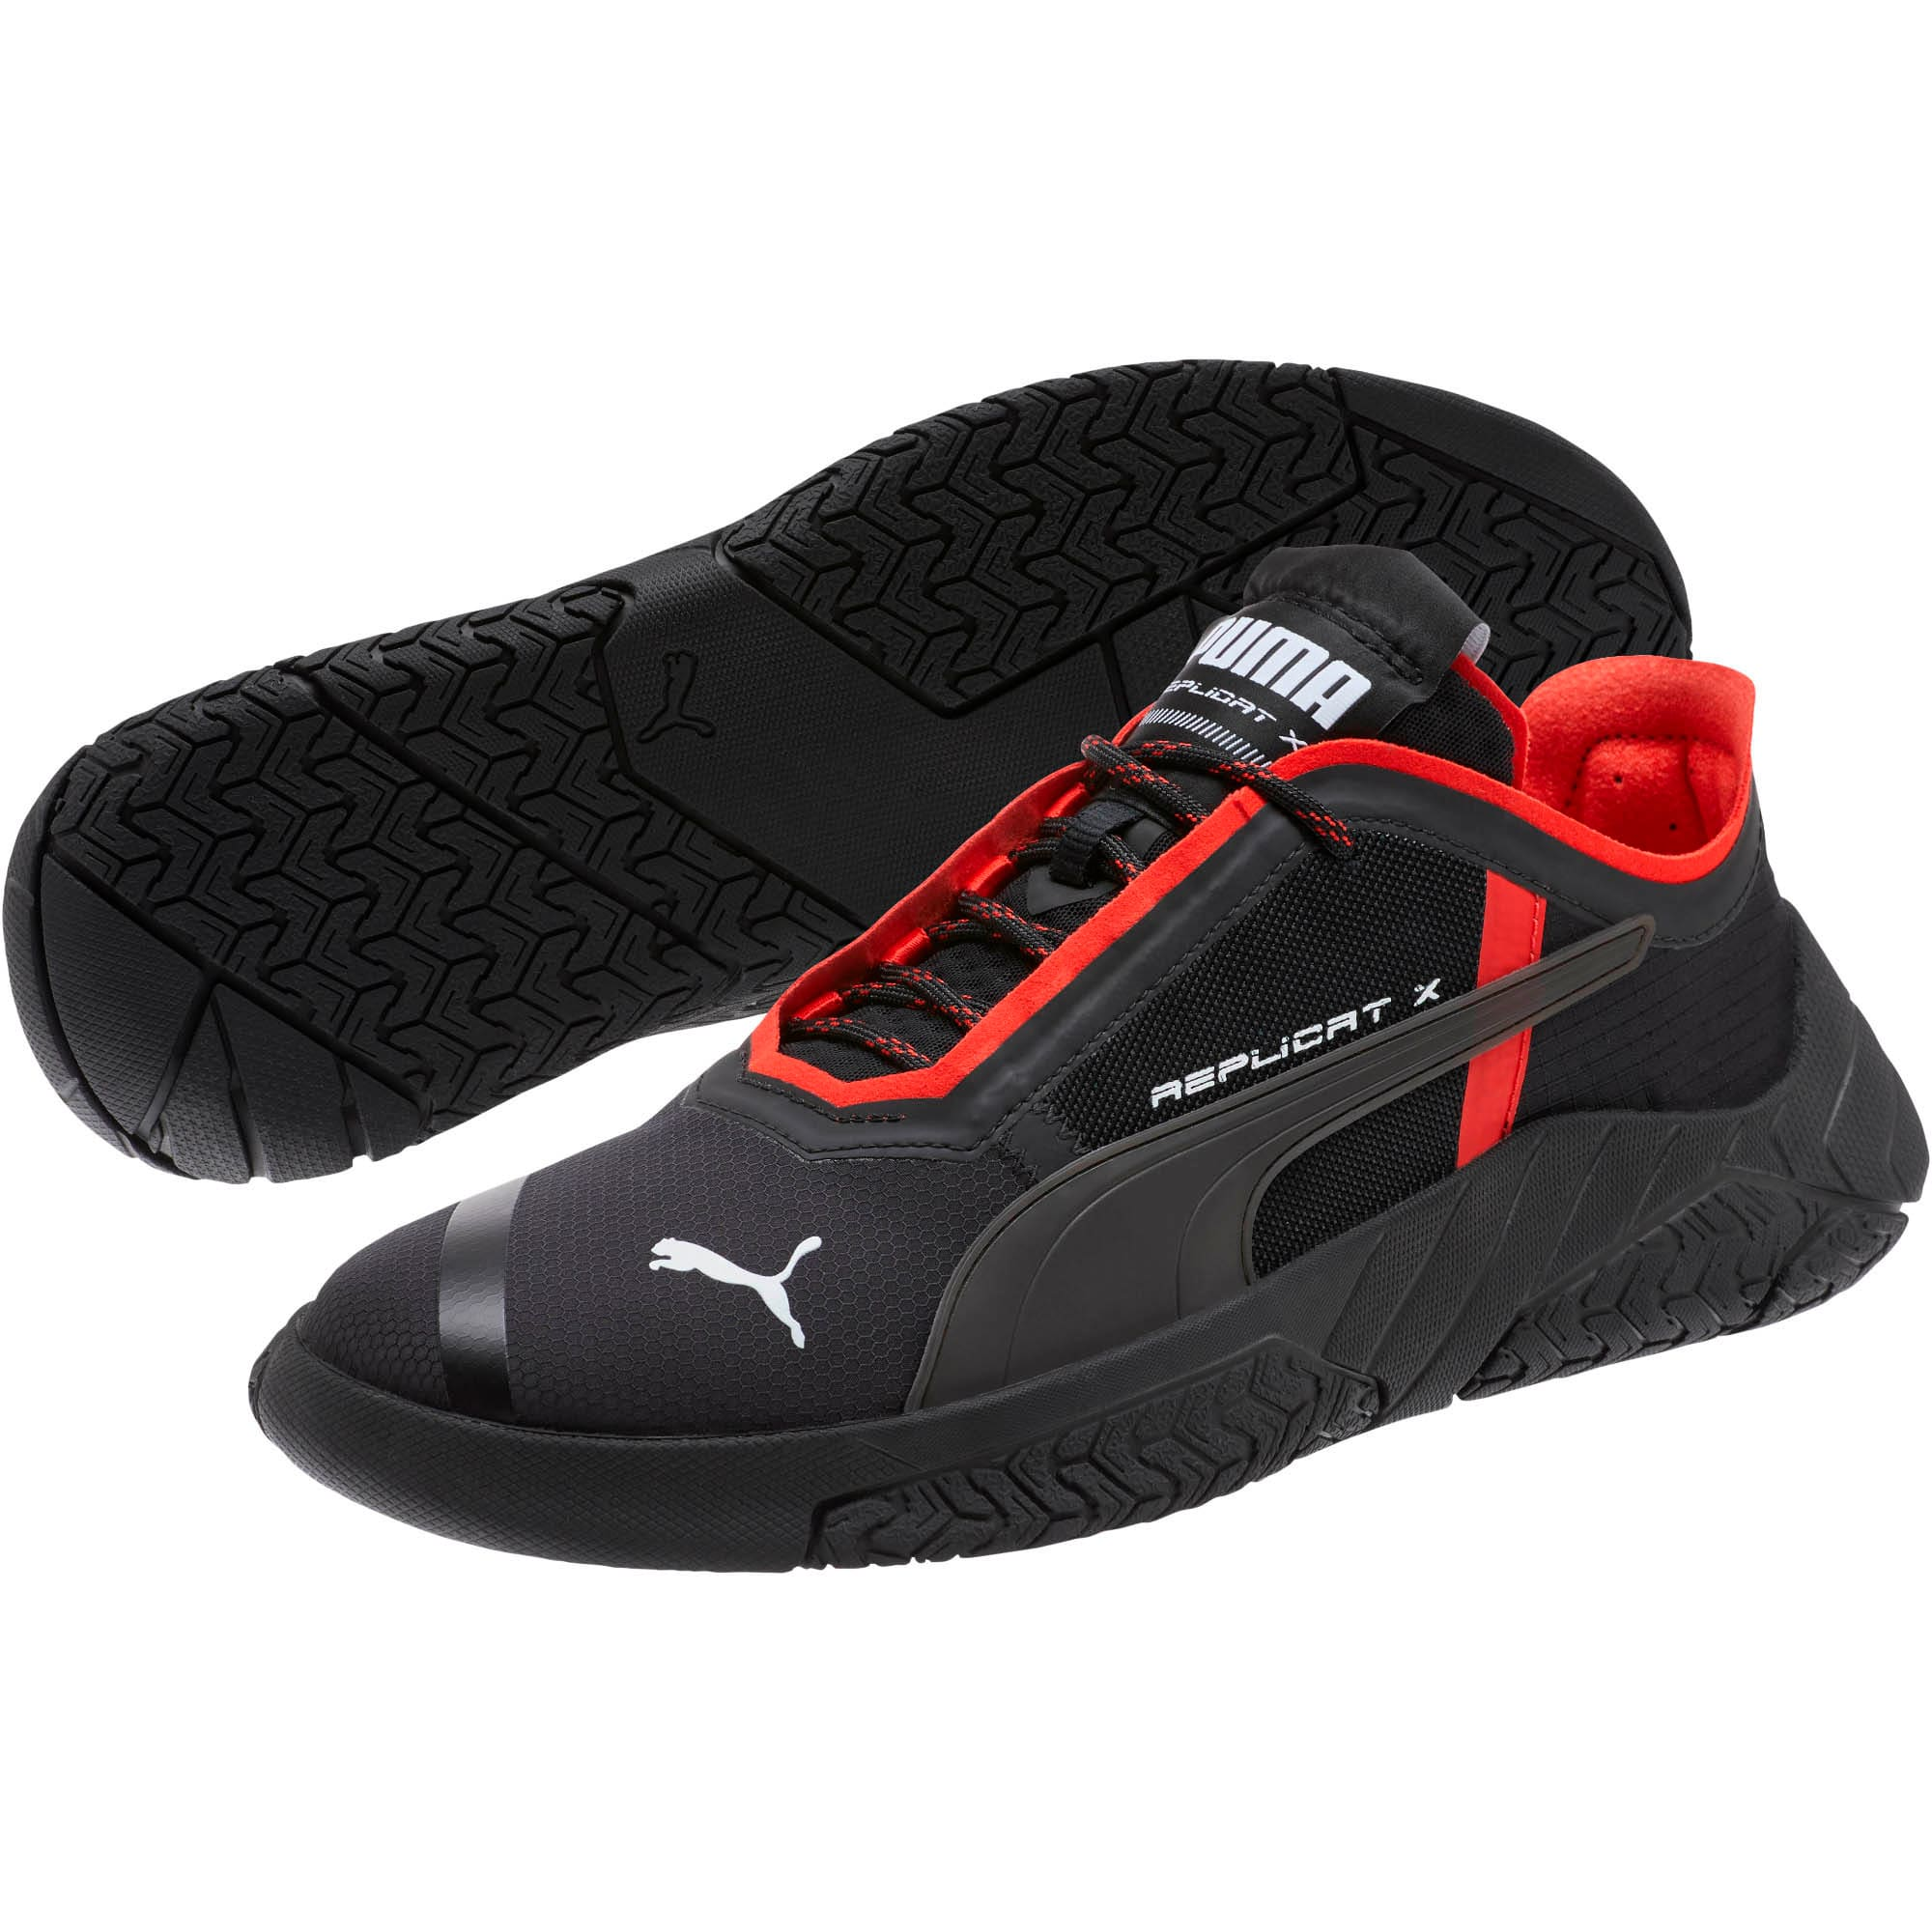 Thumbnail 2 of Replicat-X Circuit Motorsport Shoes, Puma Black-Puma Red, medium